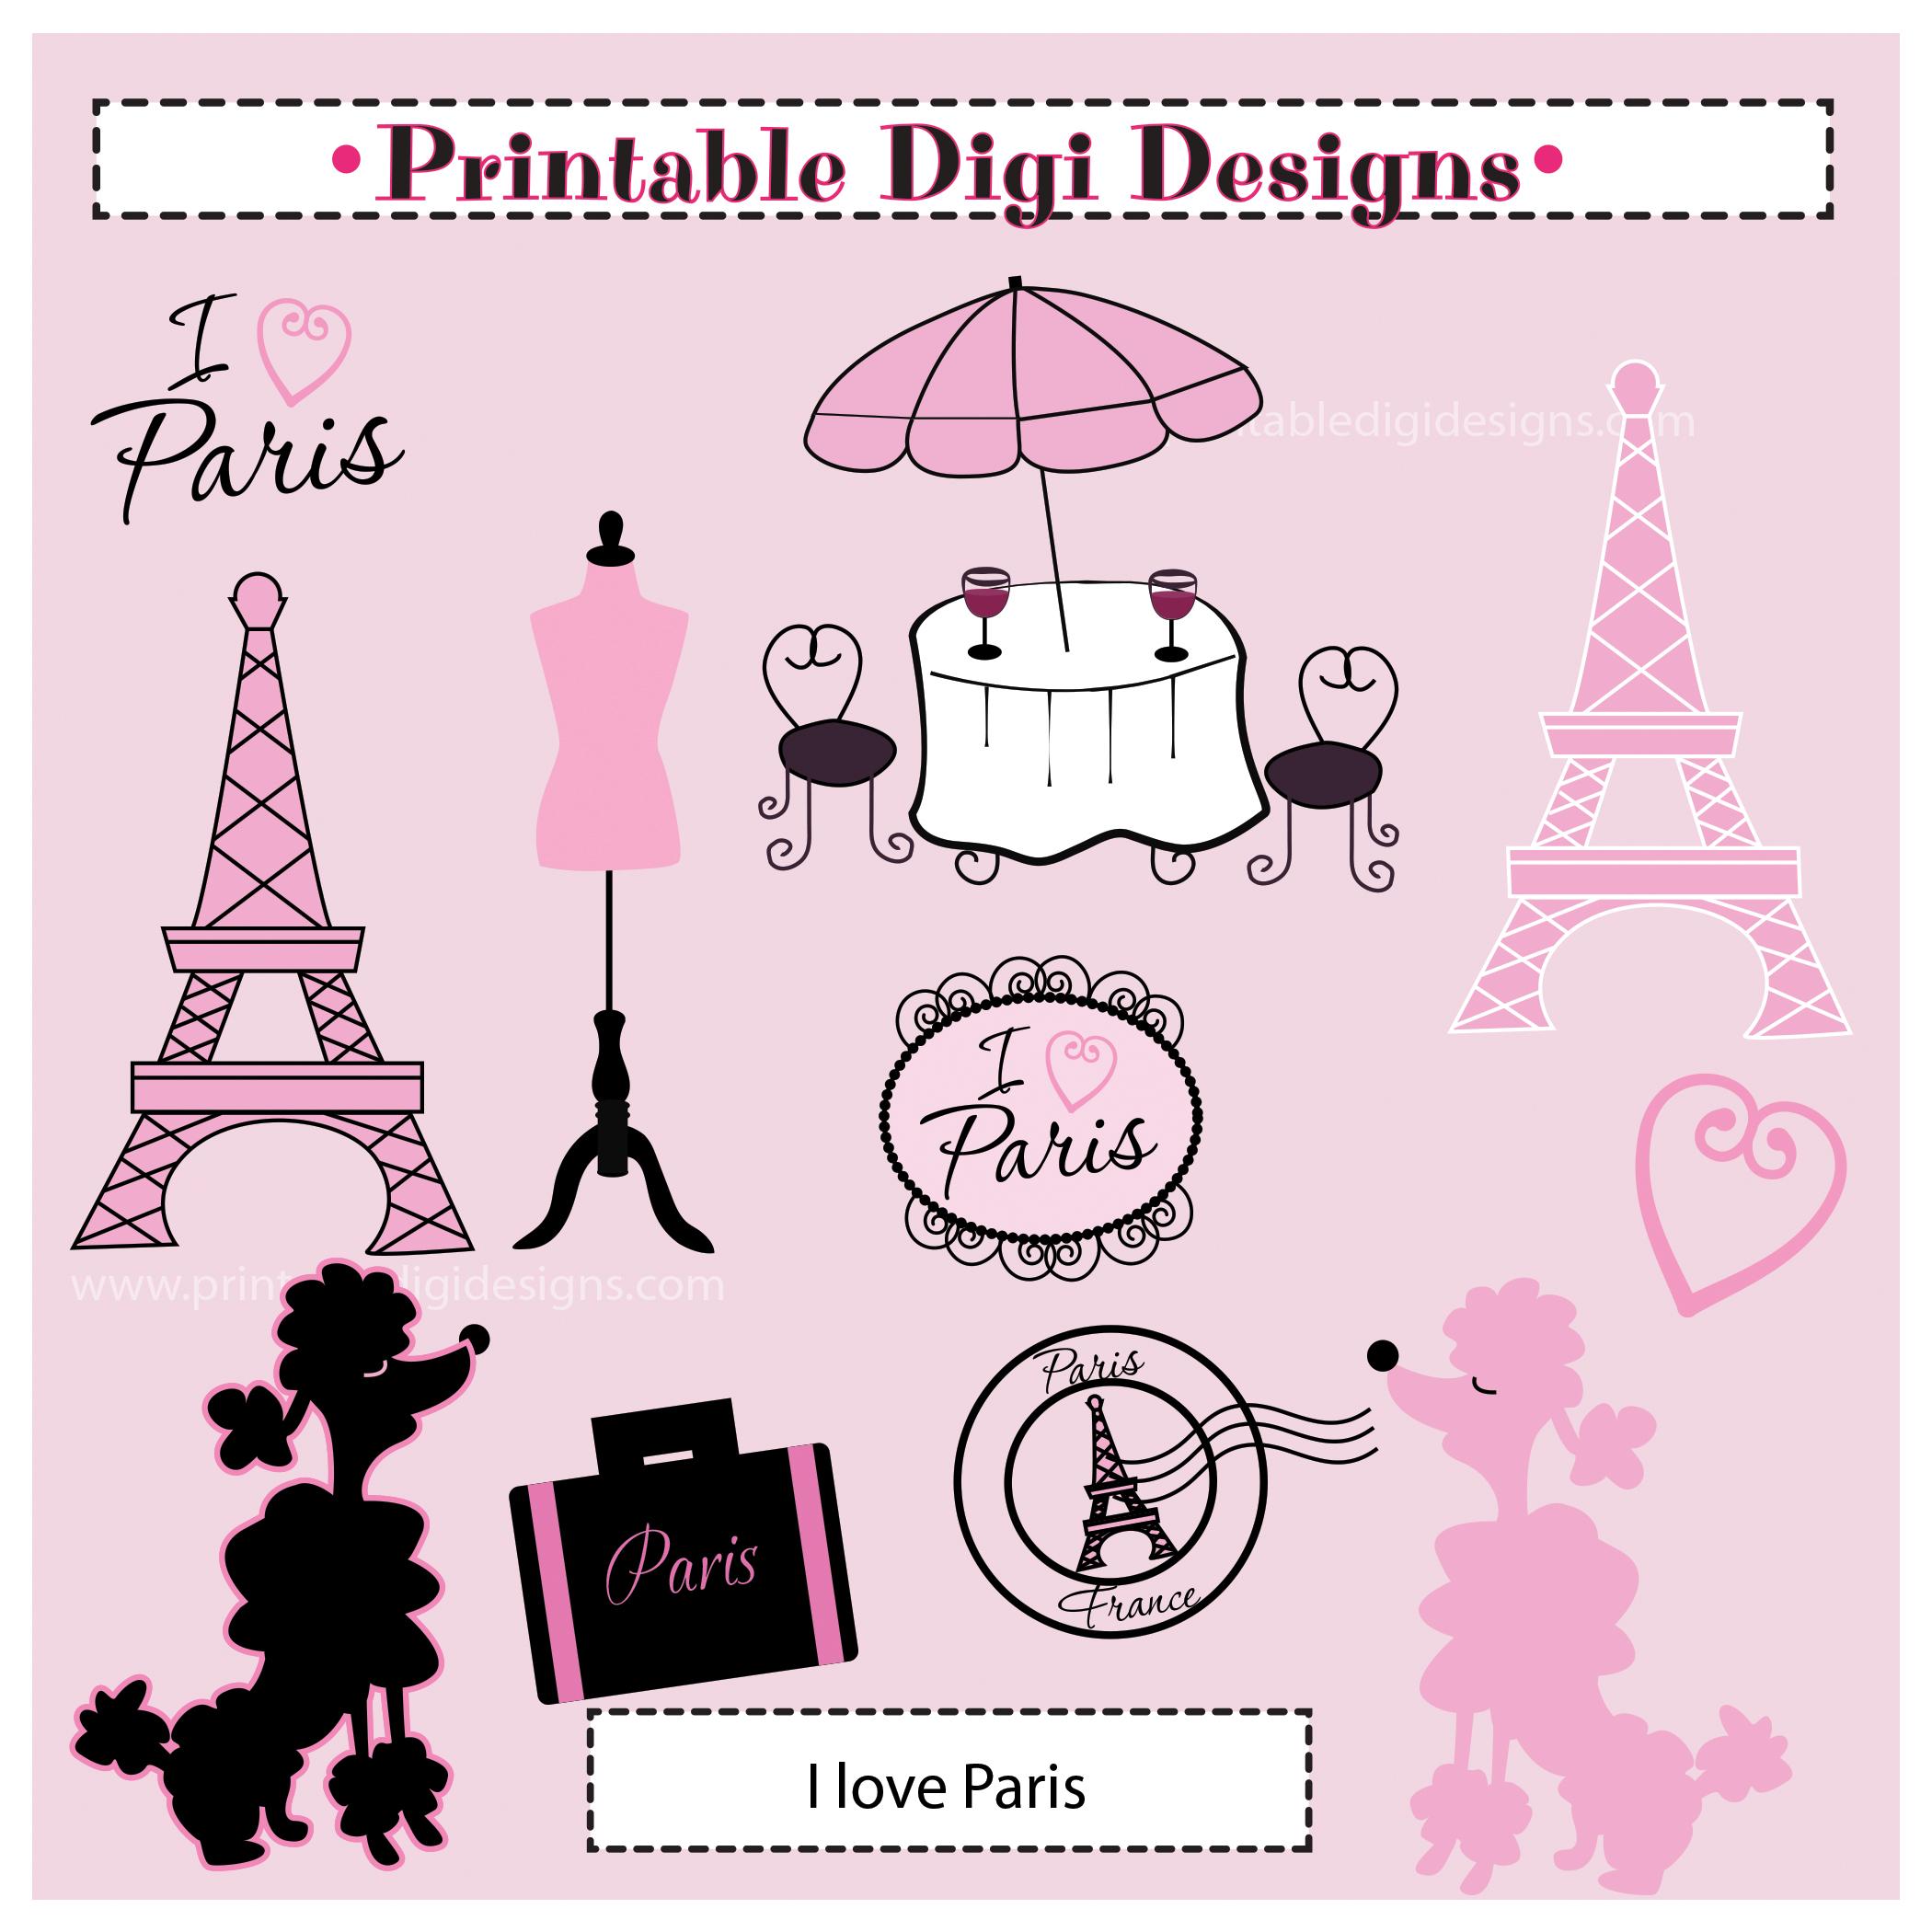 Parisian clipart free clip art library Free Paris Cafe Cliparts, Download Free Clip Art, Free Clip ... clip art library